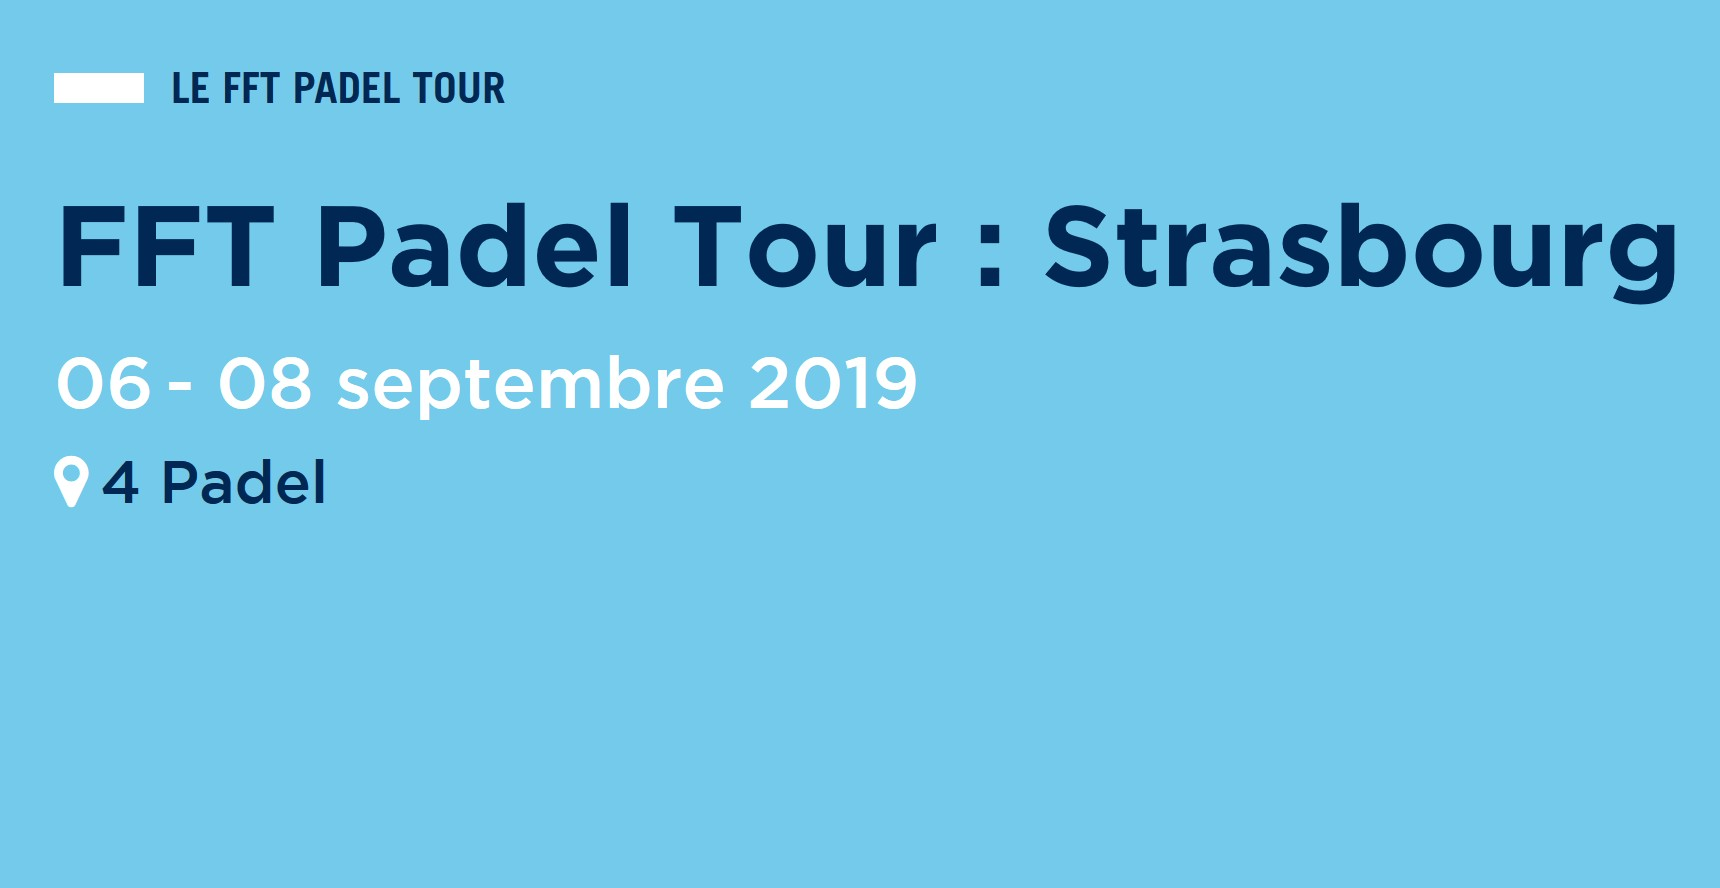 FFT Padel Tour Strasbourg – Dates